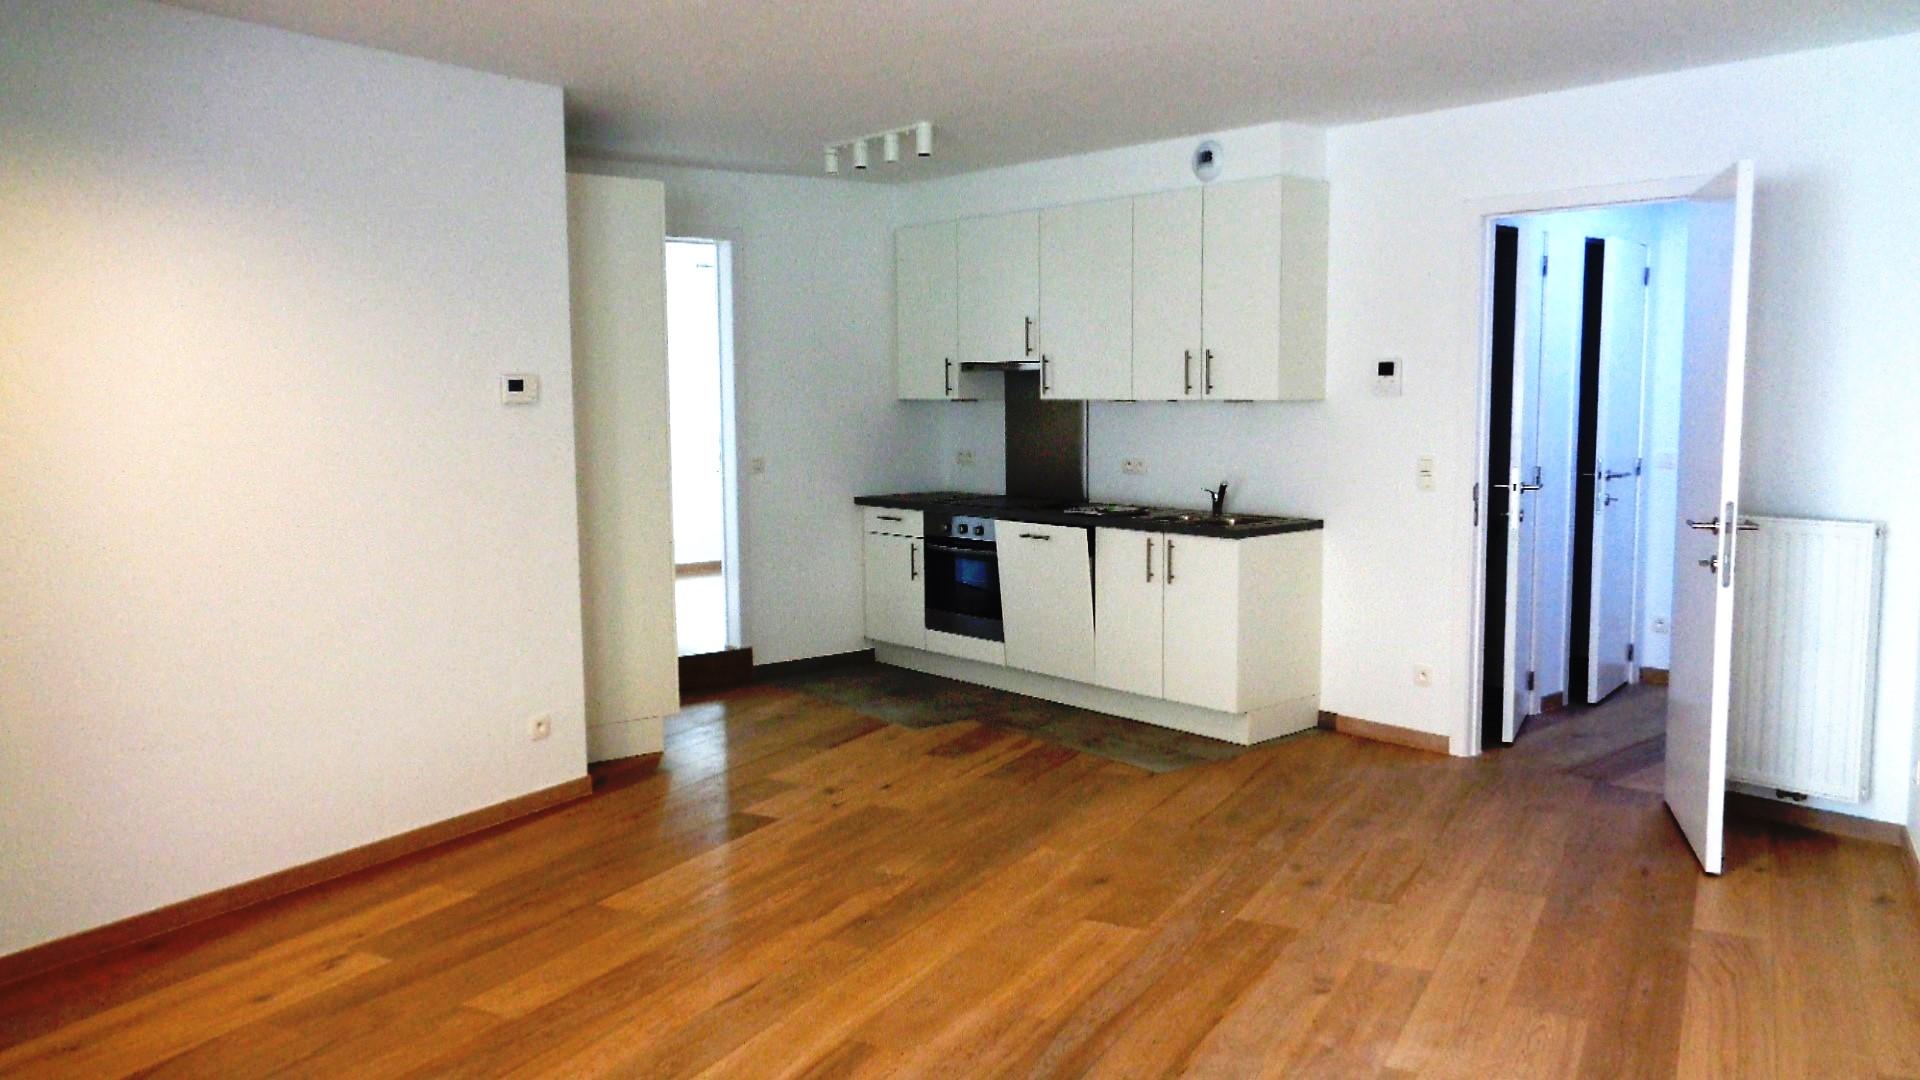 Appartement 1 chambre avec terrasse quartier Jourdan